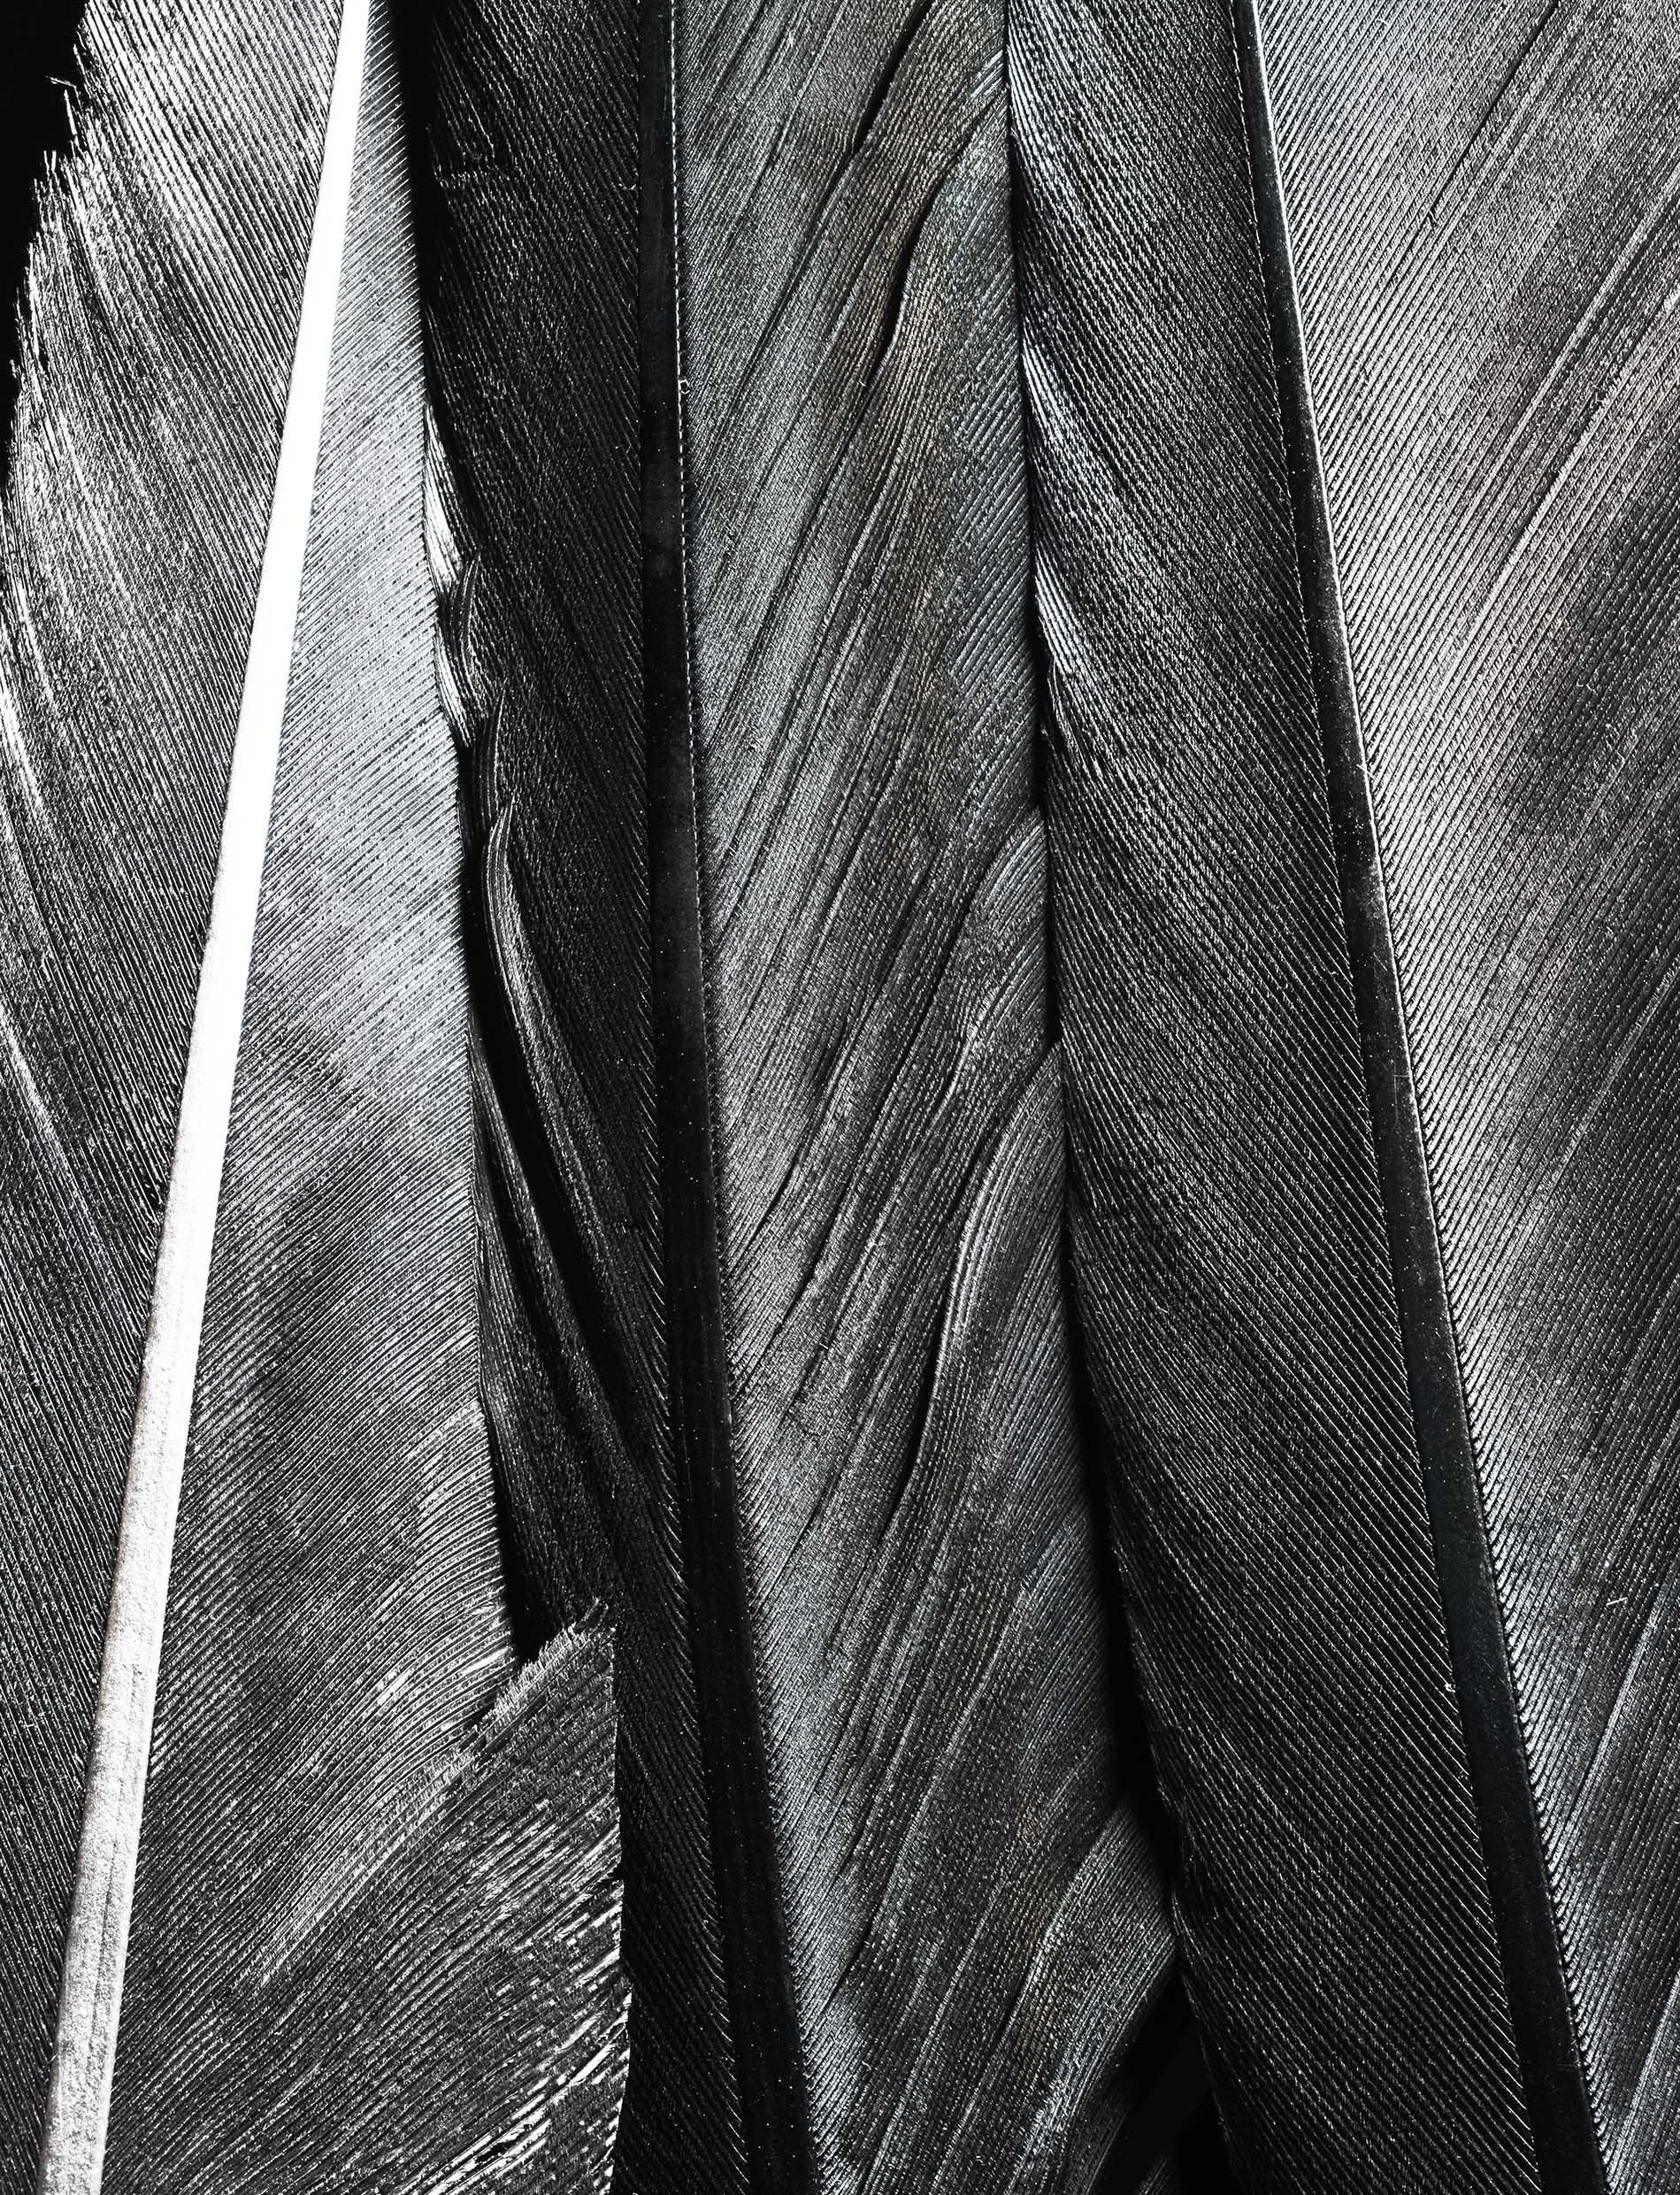 feather_03.jpg